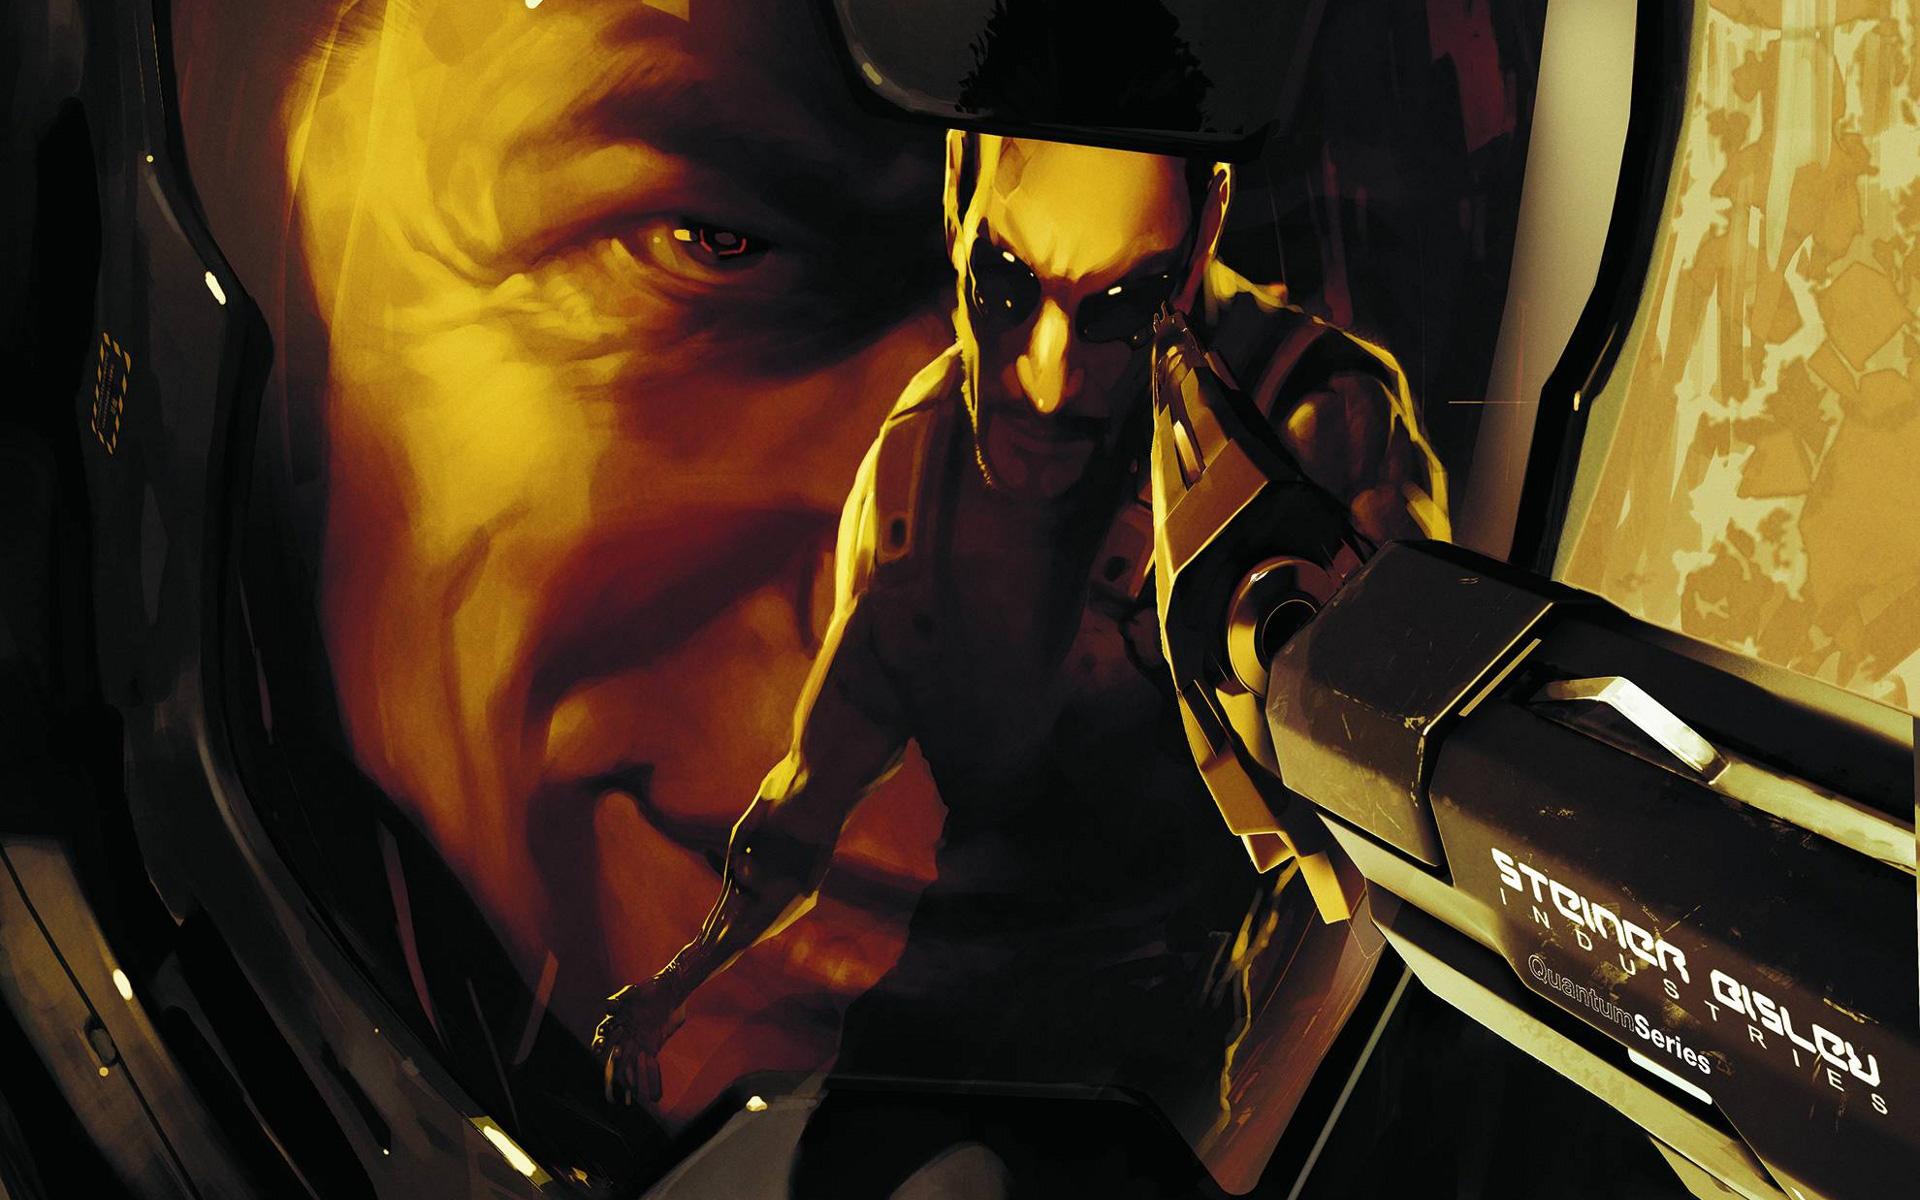 Free Deus Ex: Human Revolution Wallpaper in 1920x1200